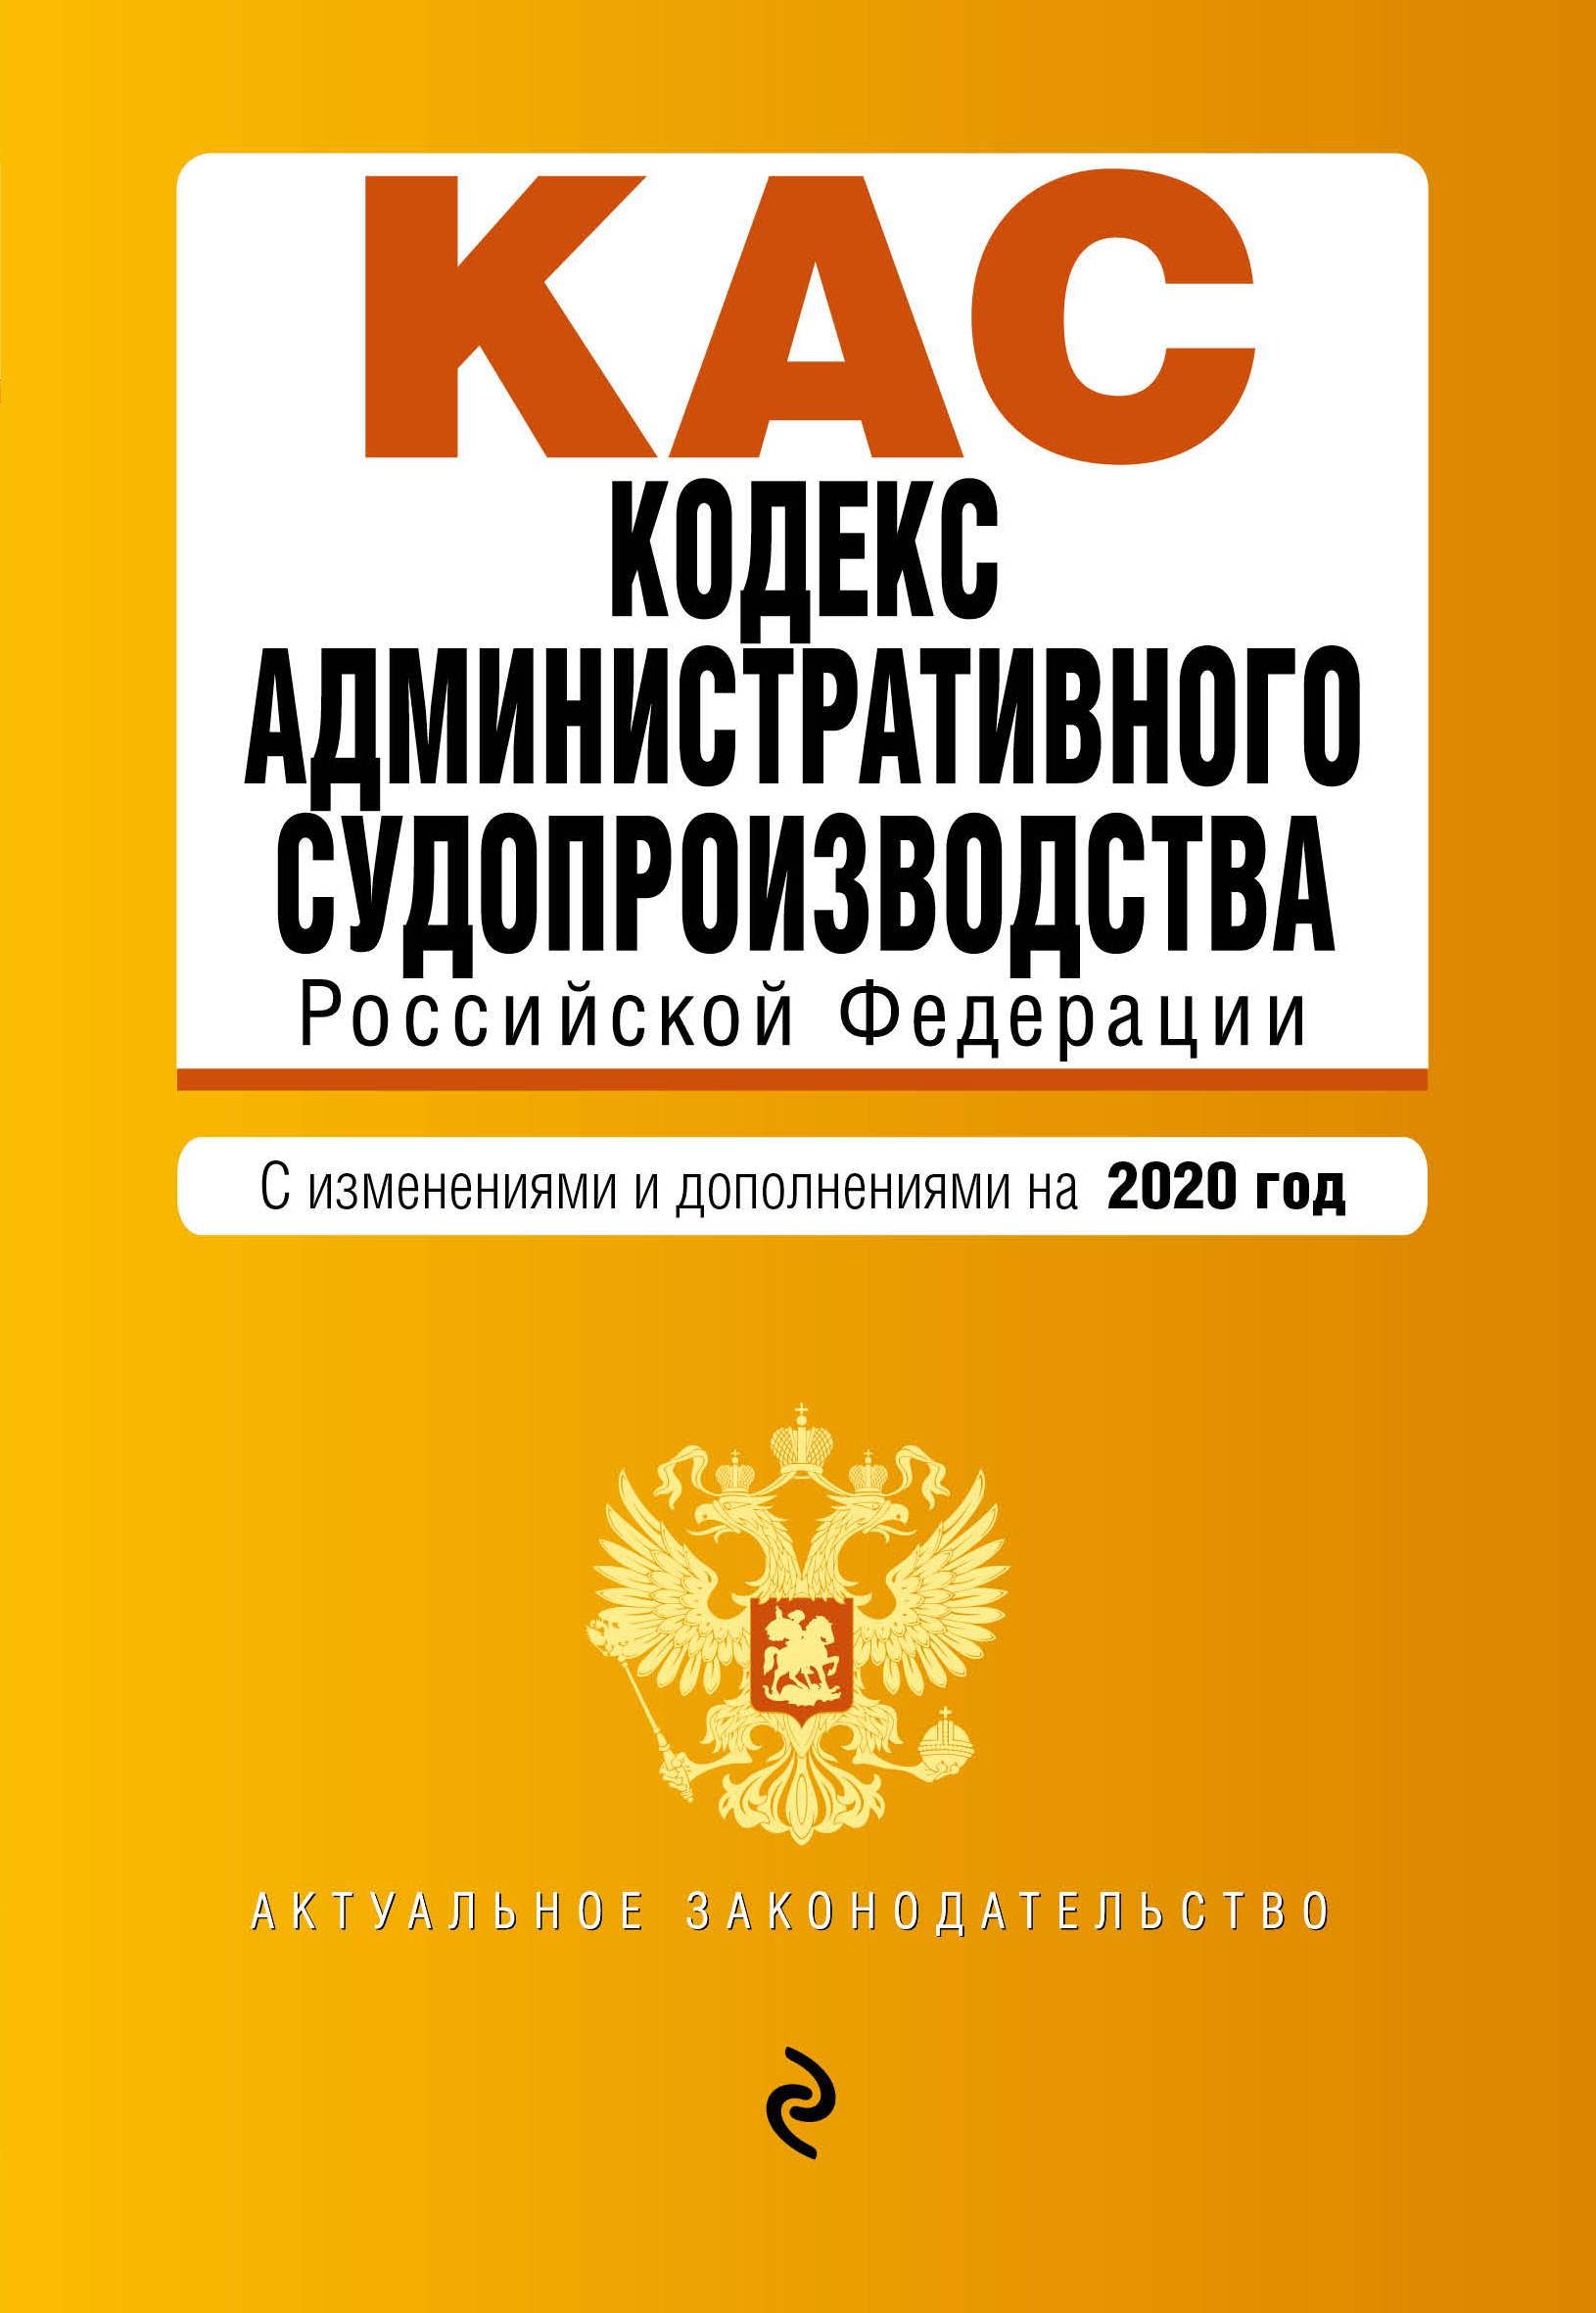 Кодекс административного судопроизводства РФ. Текст с посл. изм. и доп. на 2020 г.